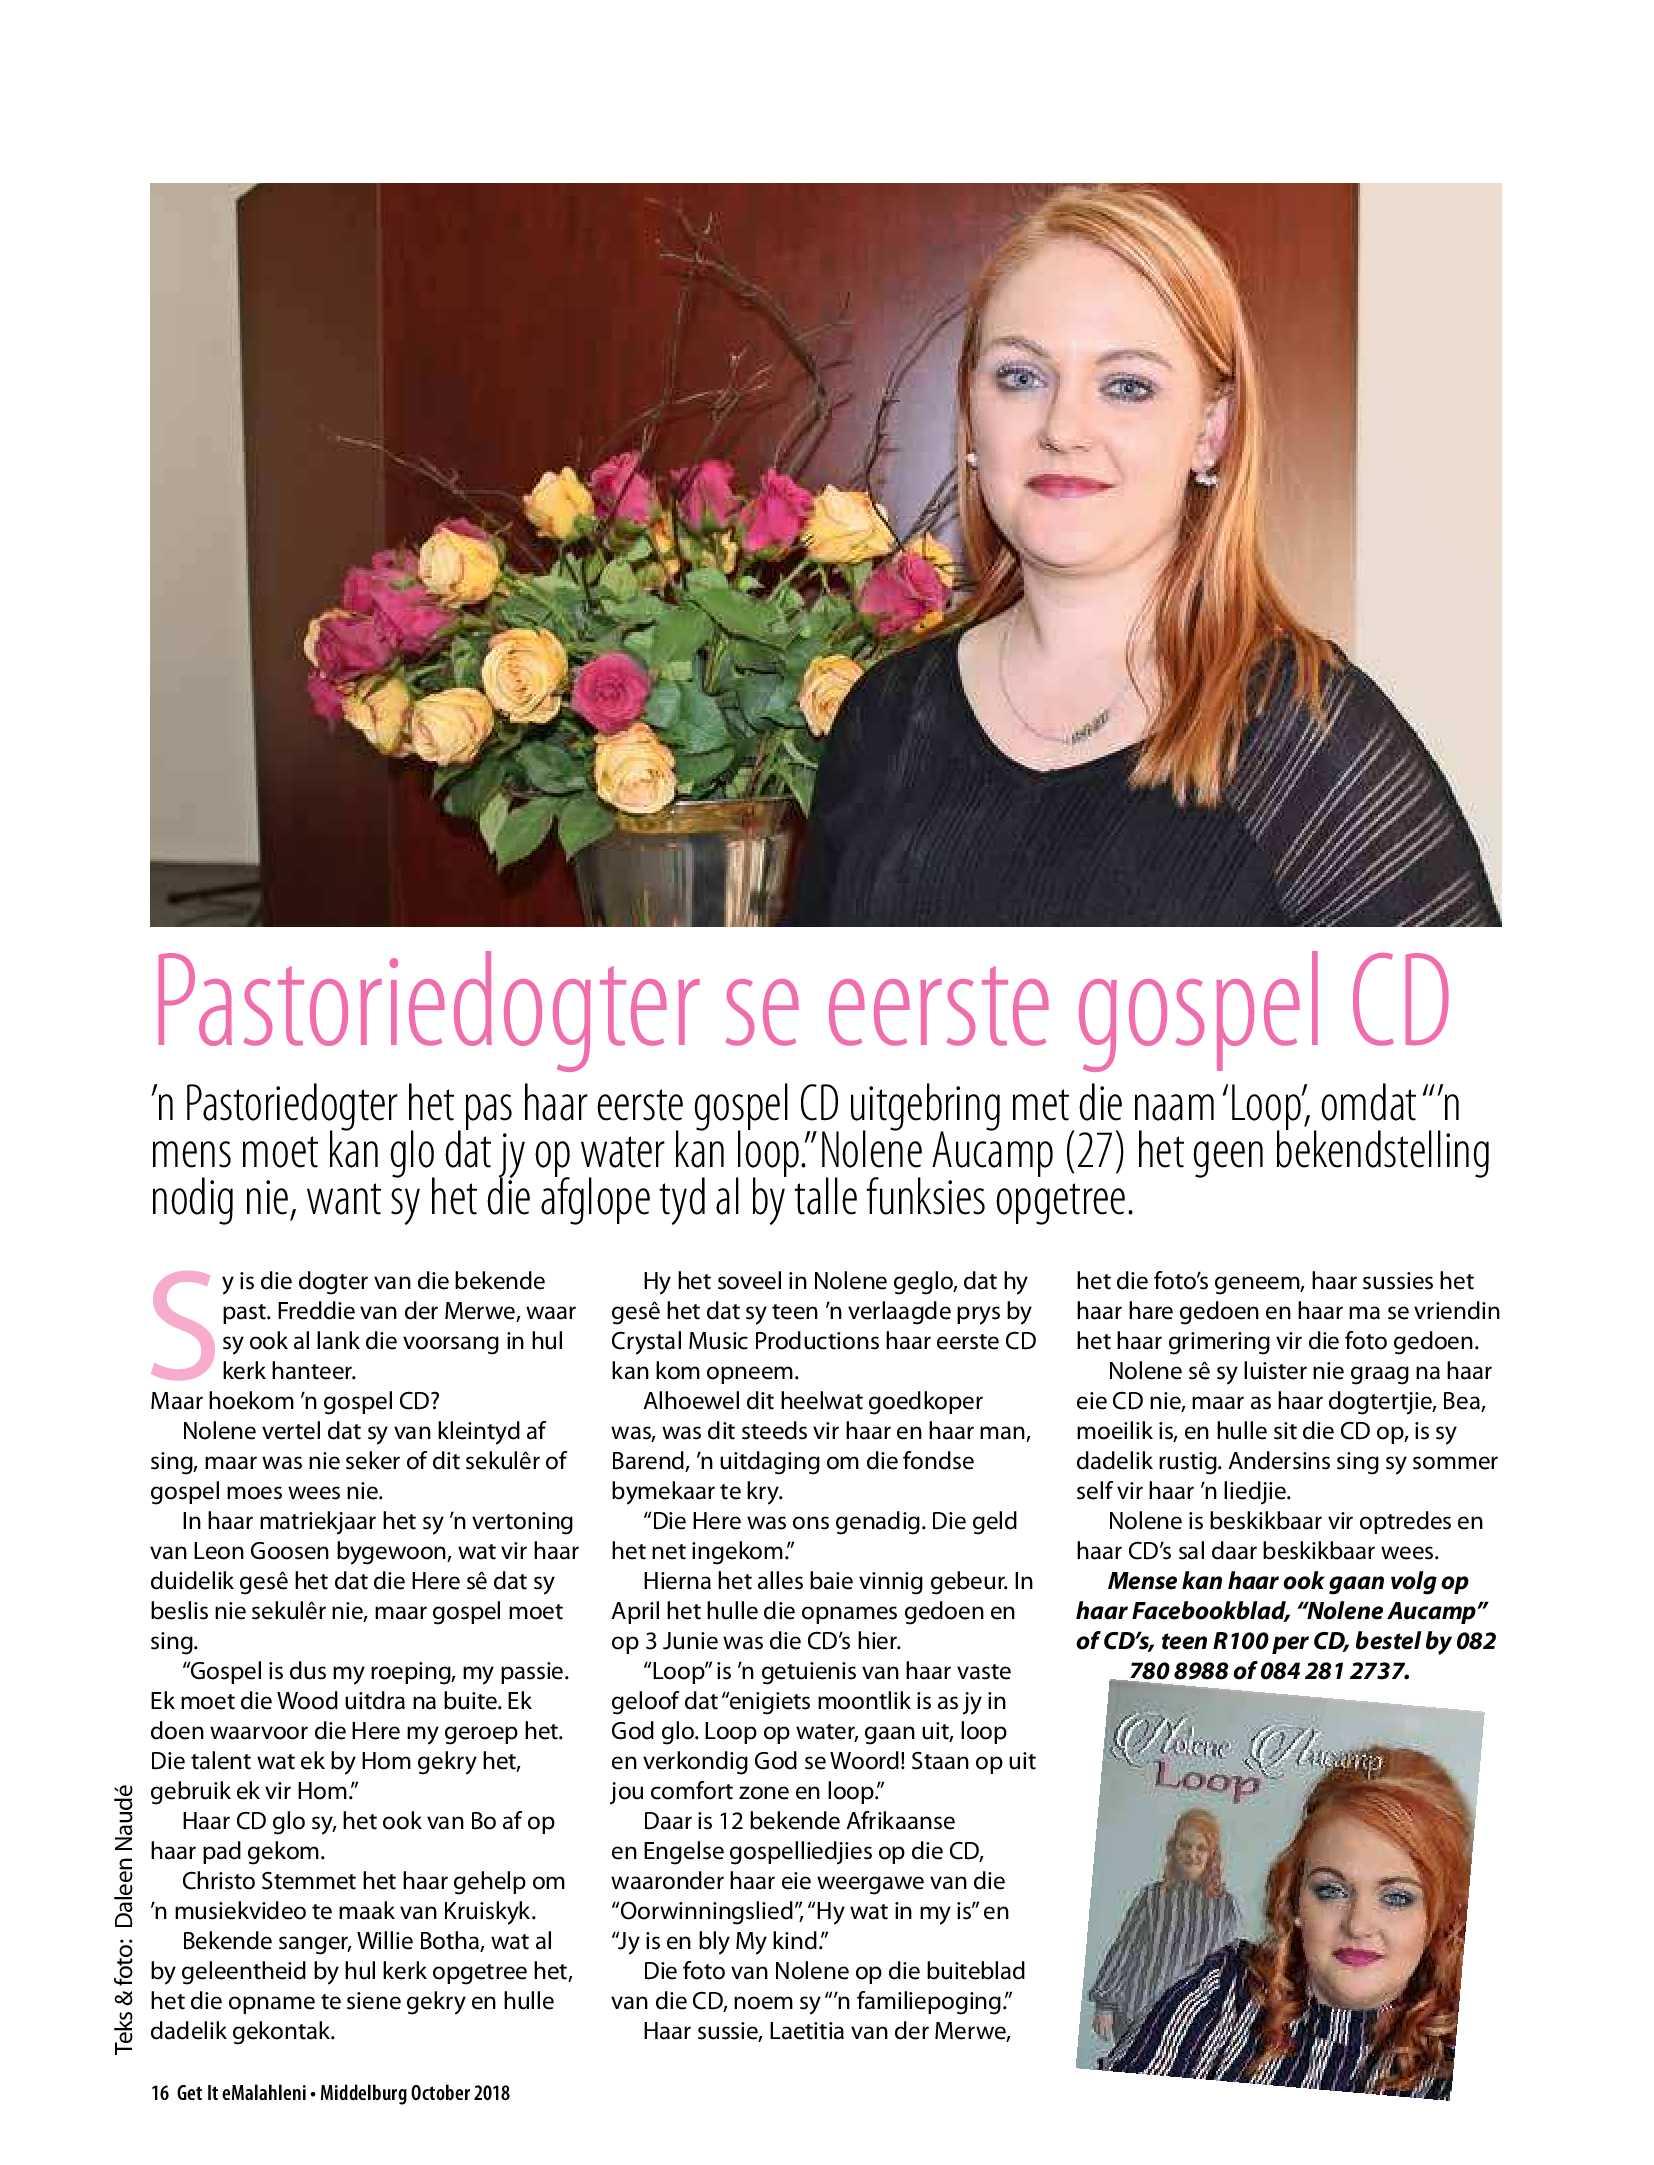 get-middelburg-october-2018-epapers-page-18